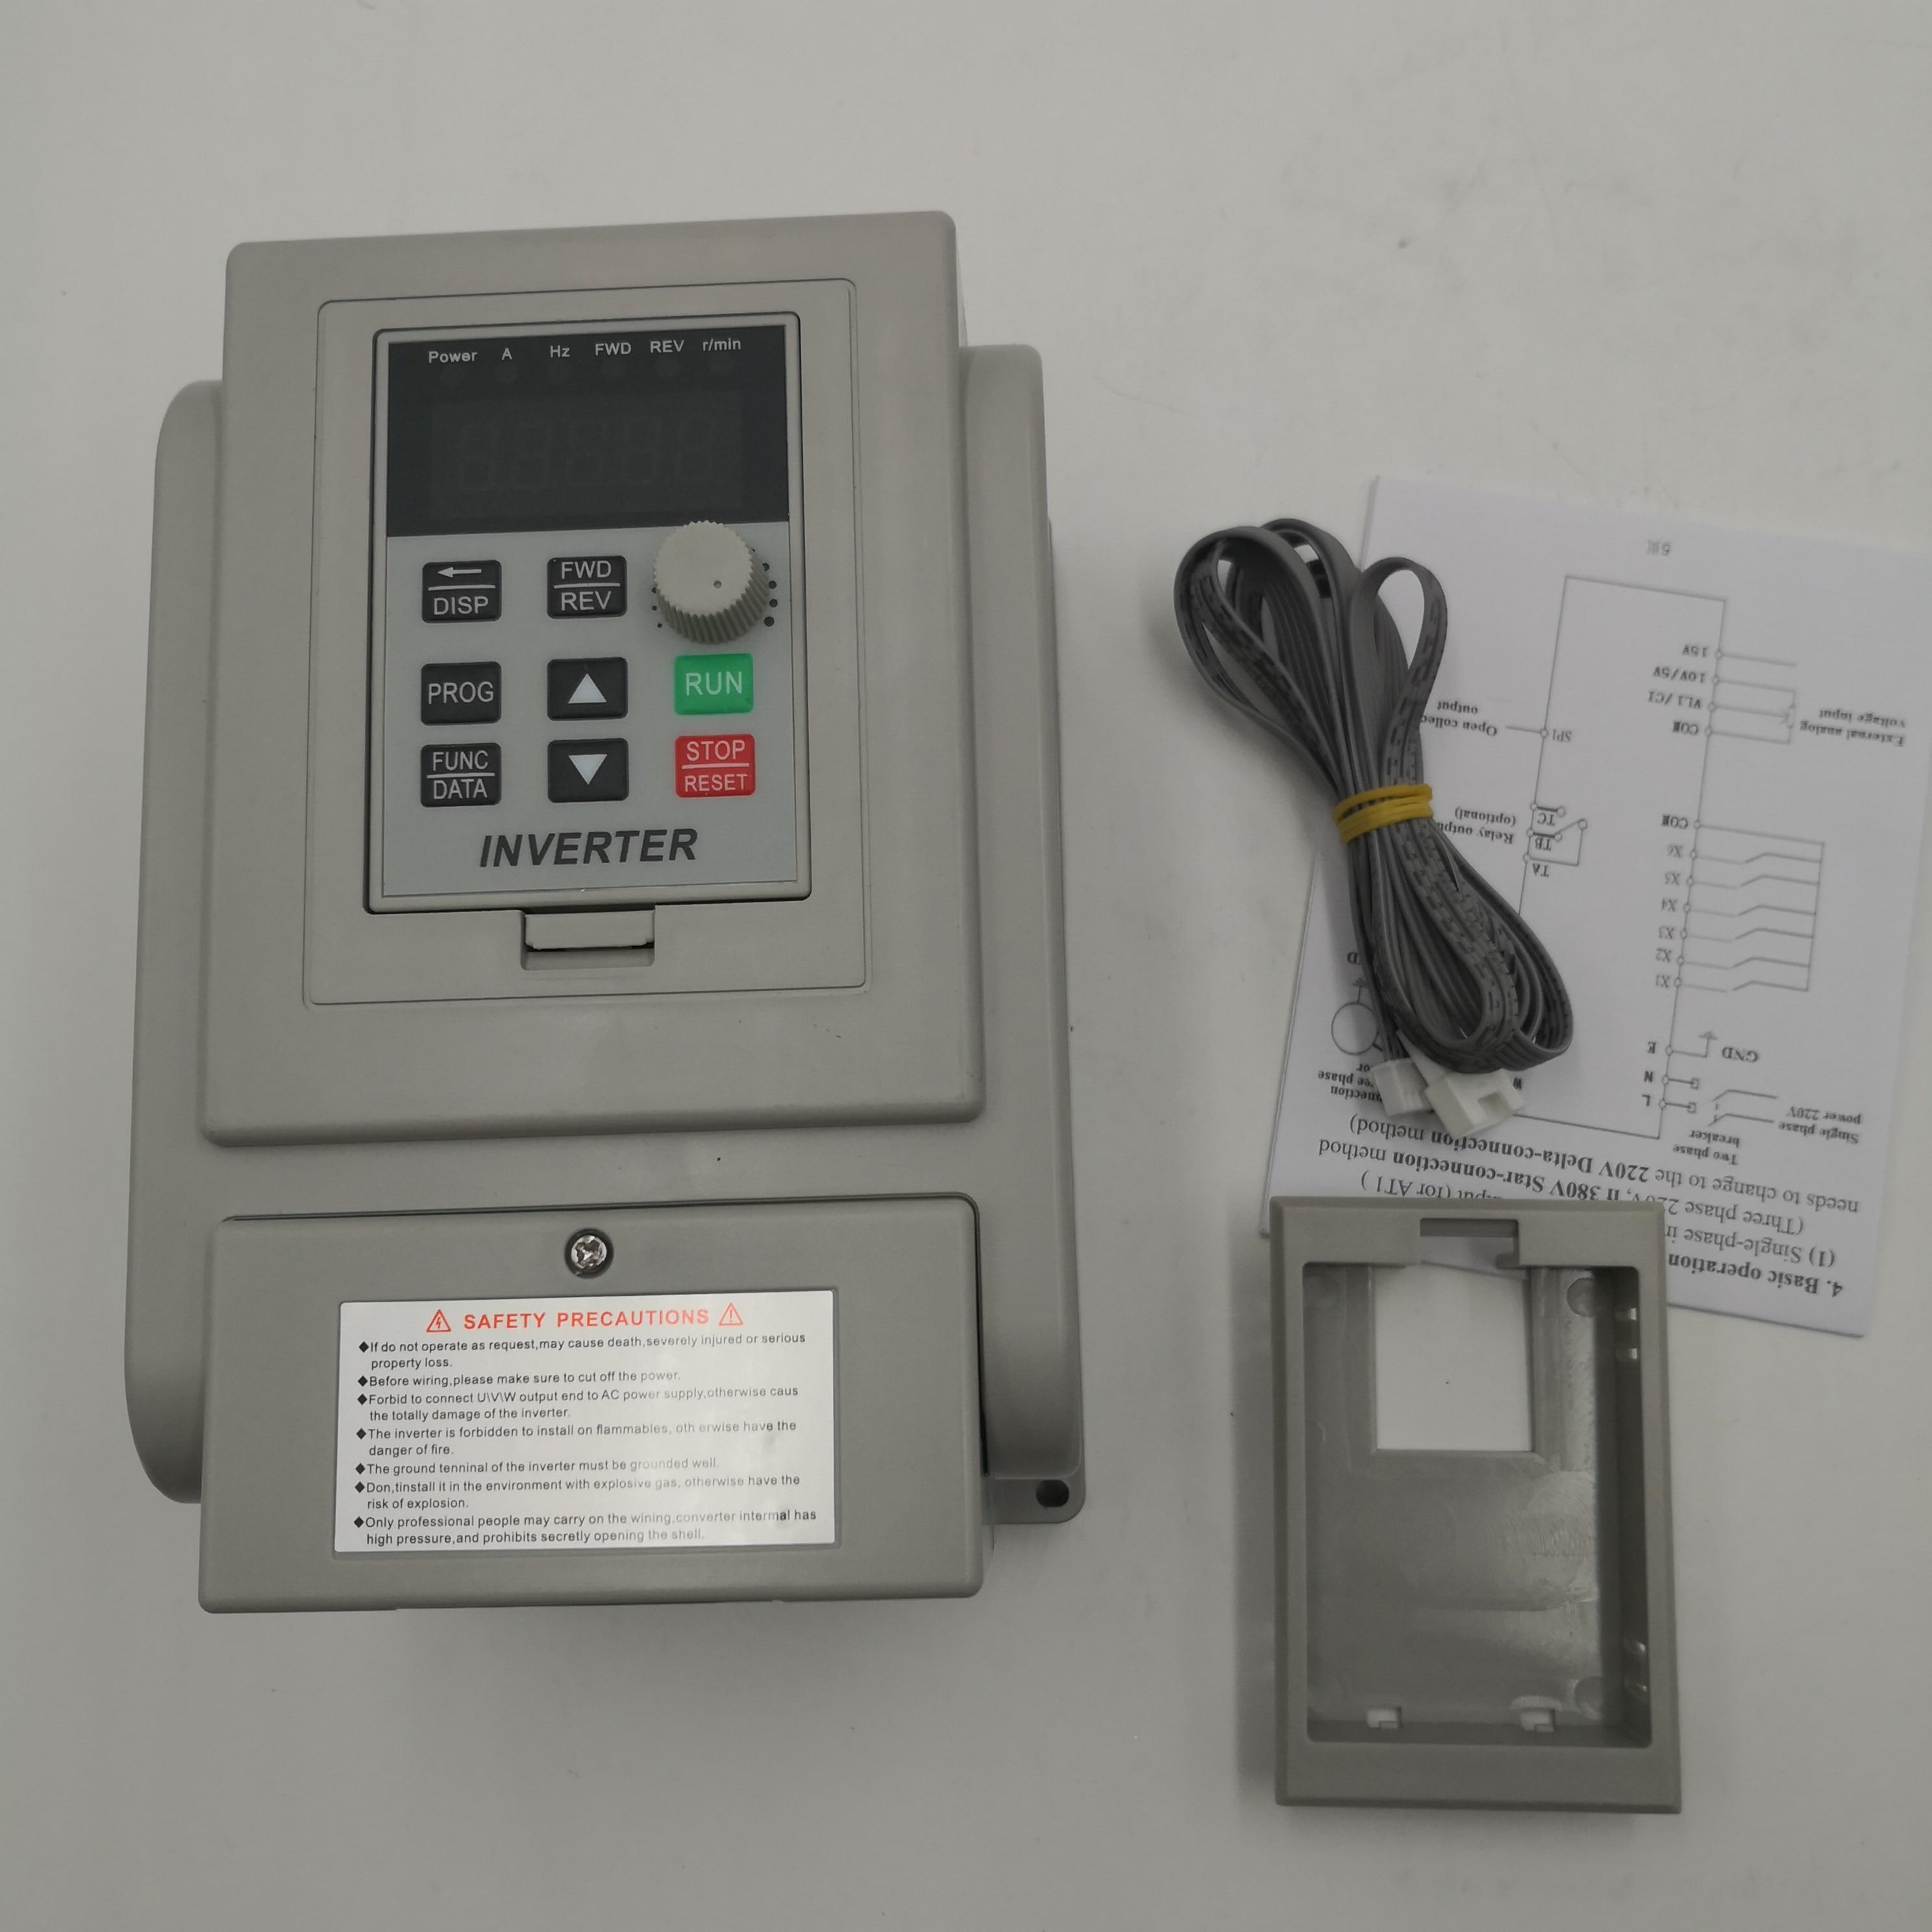 VFD 220V 1P-220v 3P Frequency Converter Combo for 17 USD mxgfk